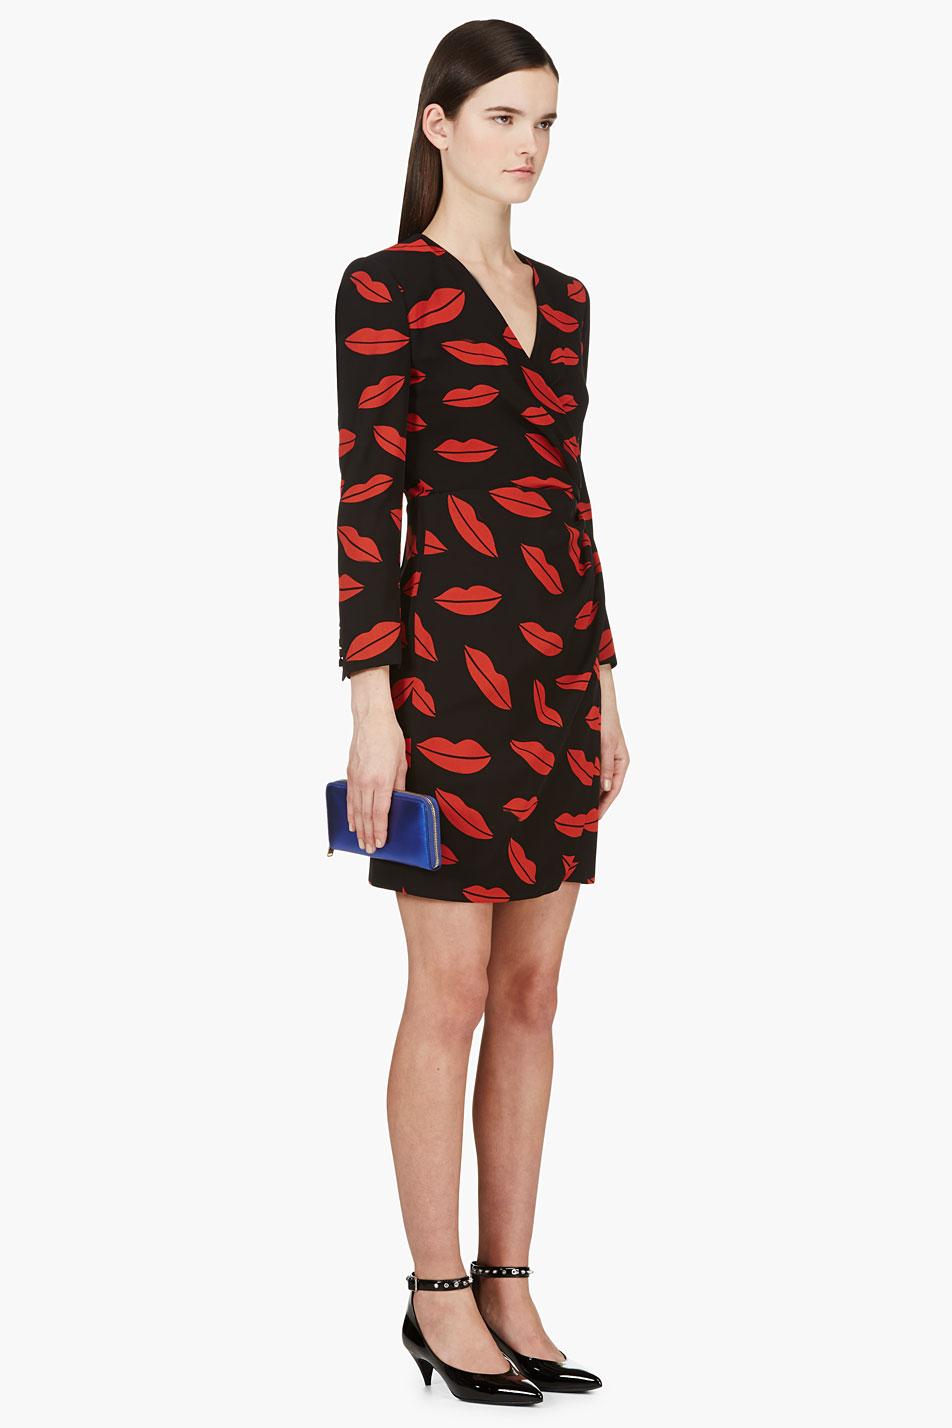 Saint Laurent Black Silk Chiffon Lips Wrap Dress In Red Lyst